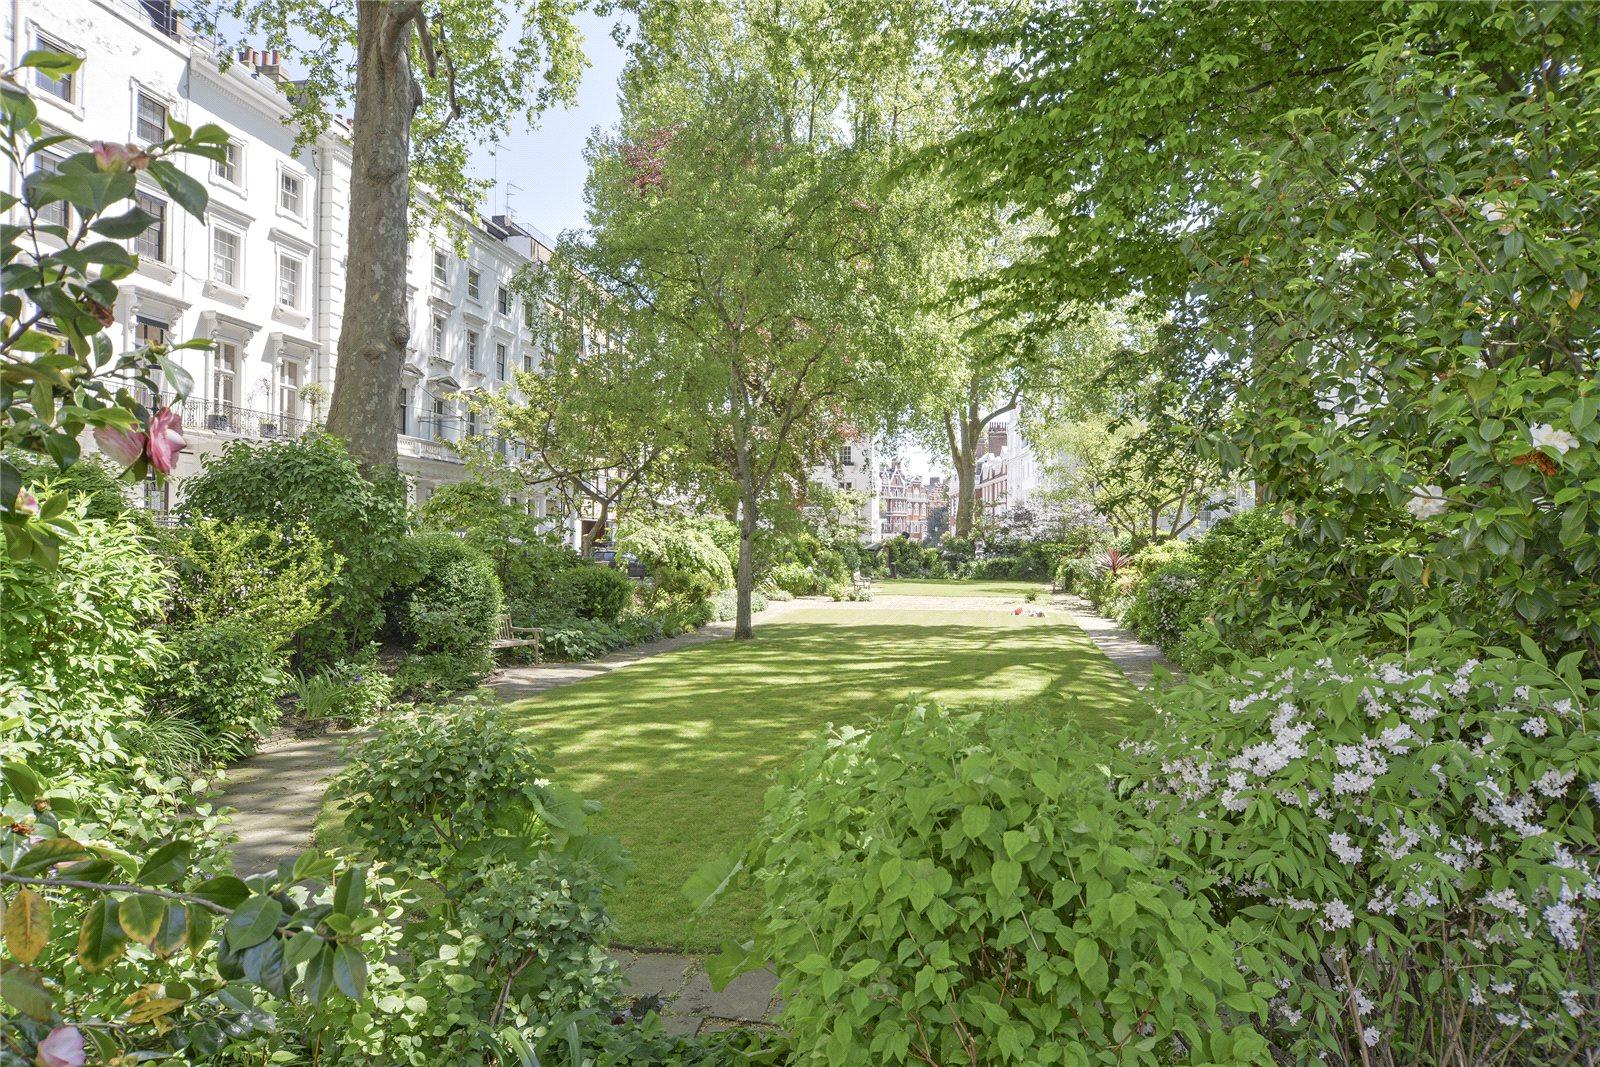 Апартаменты / Квартиры для того Продажа на Ovington Square, London, SW3 London, Англия